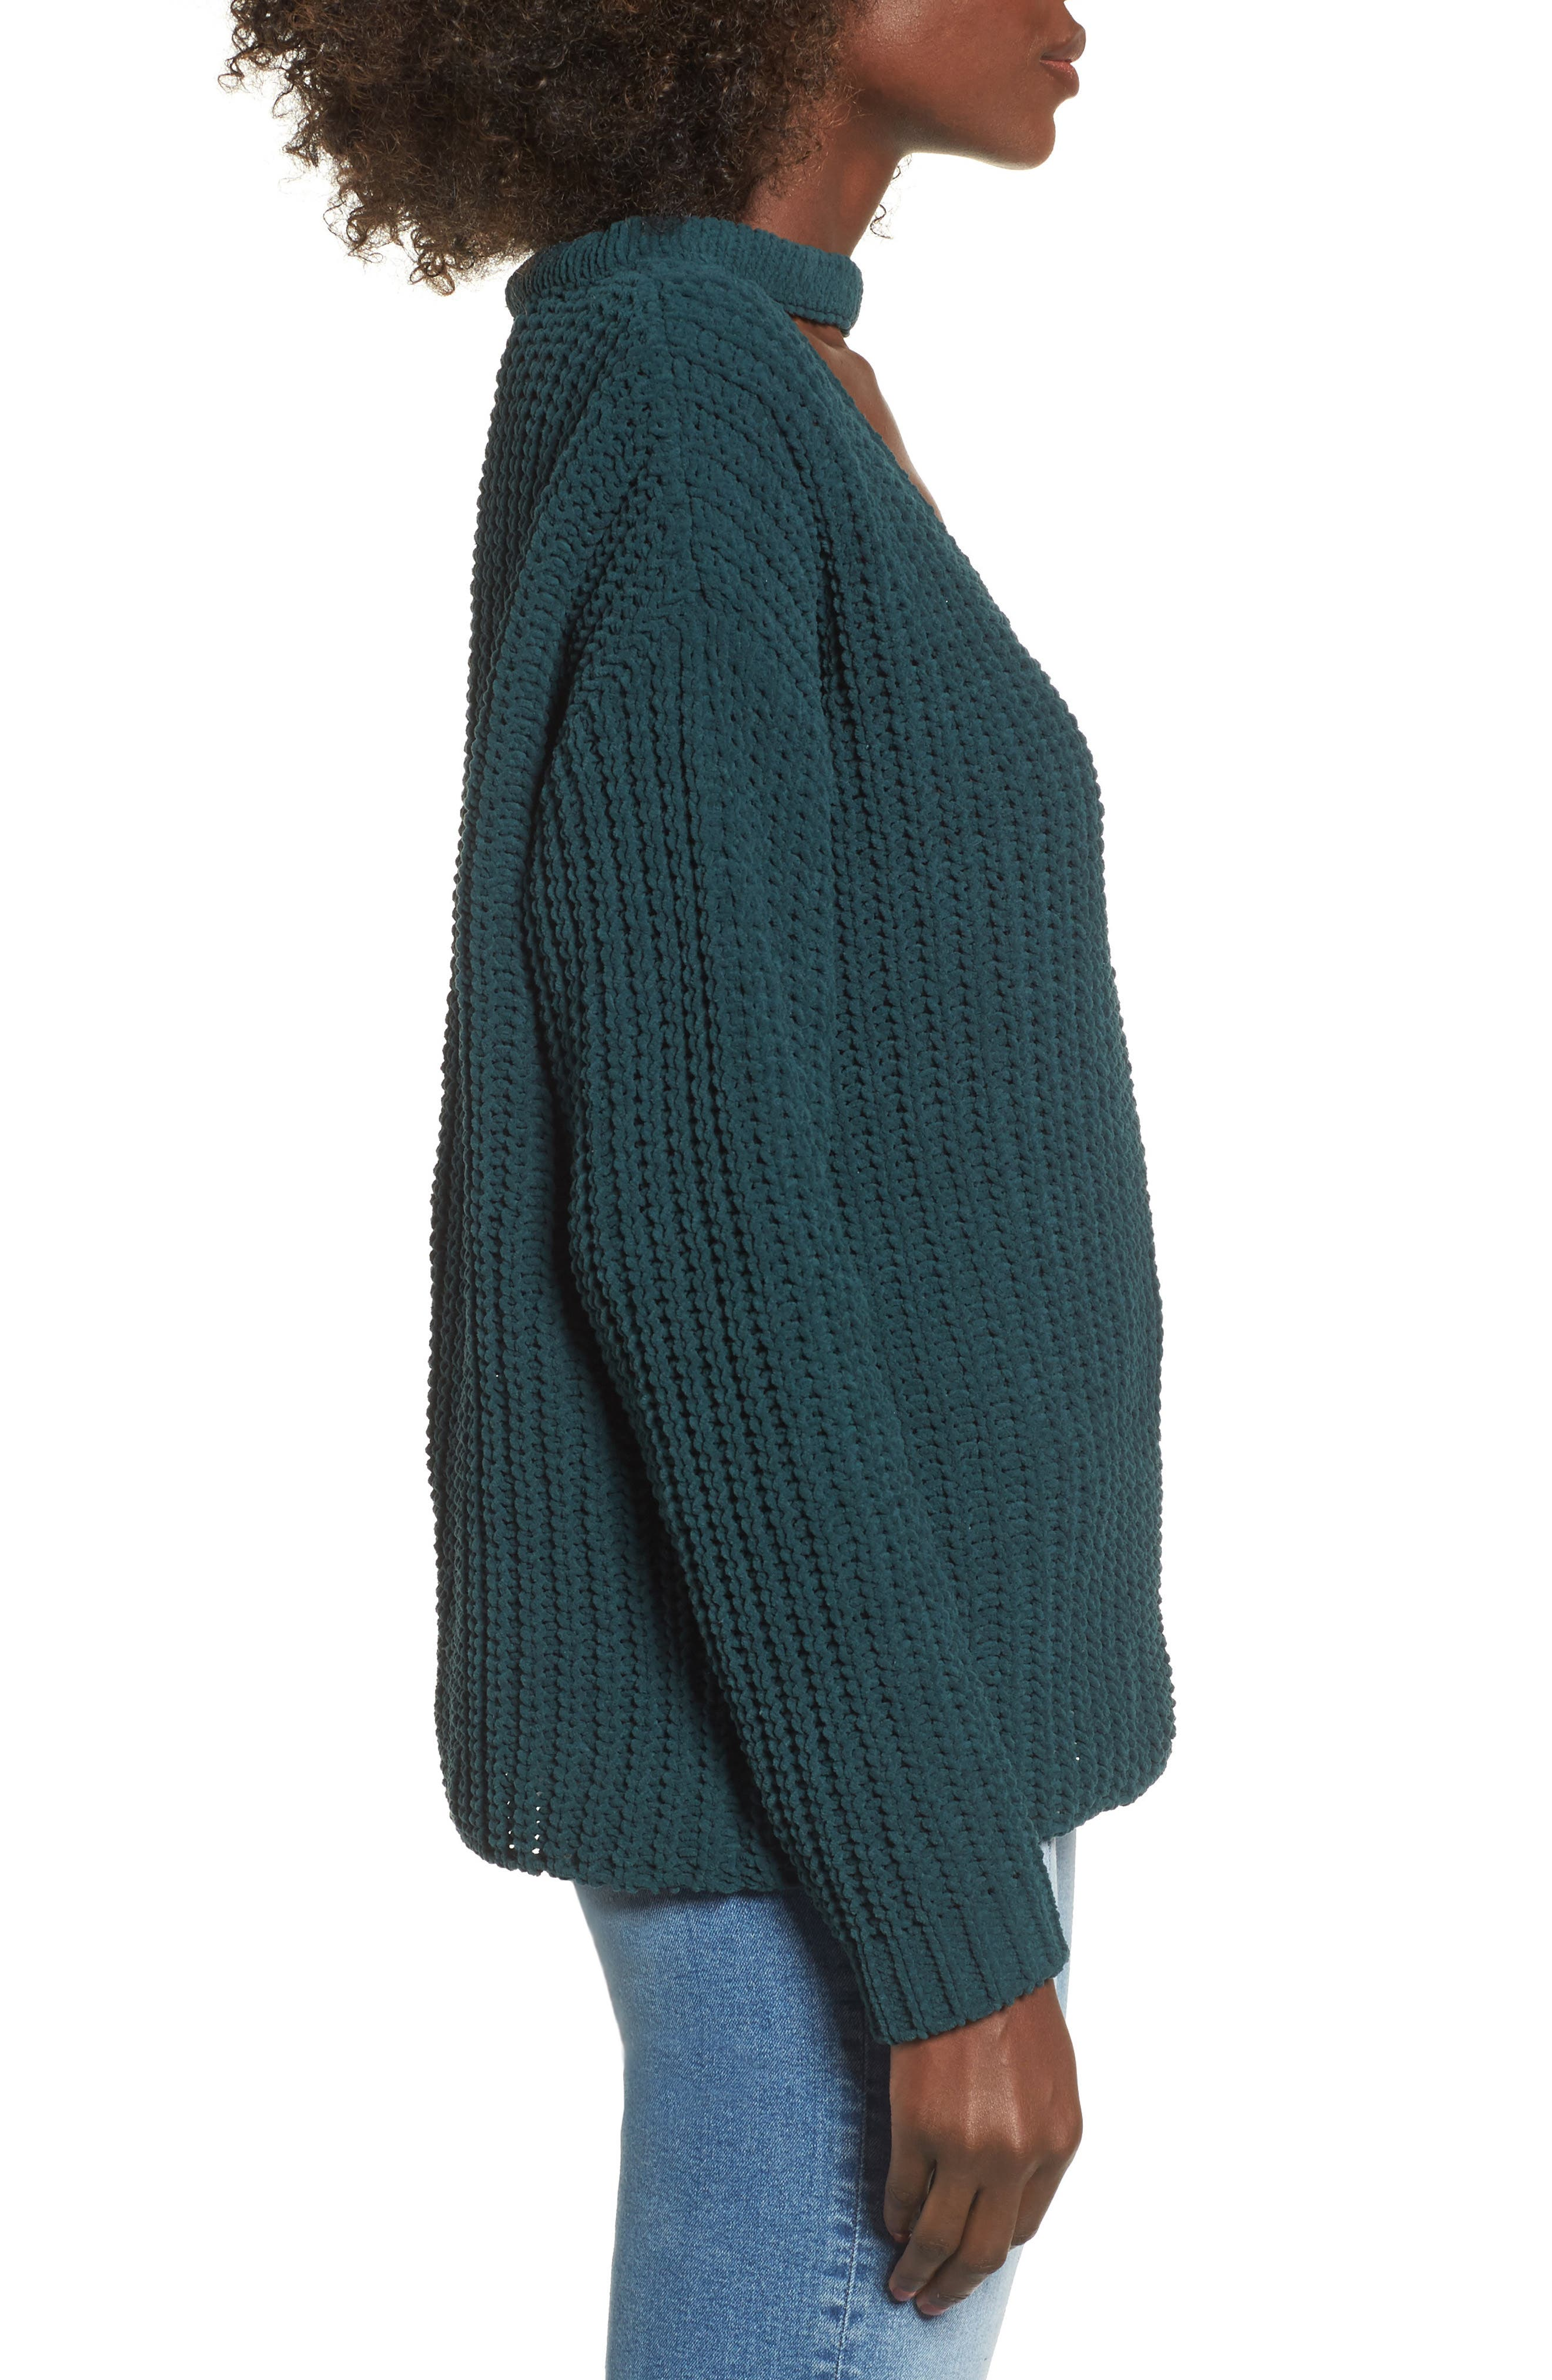 Mary Lous Choker Sweater,                             Alternate thumbnail 3, color,                             300